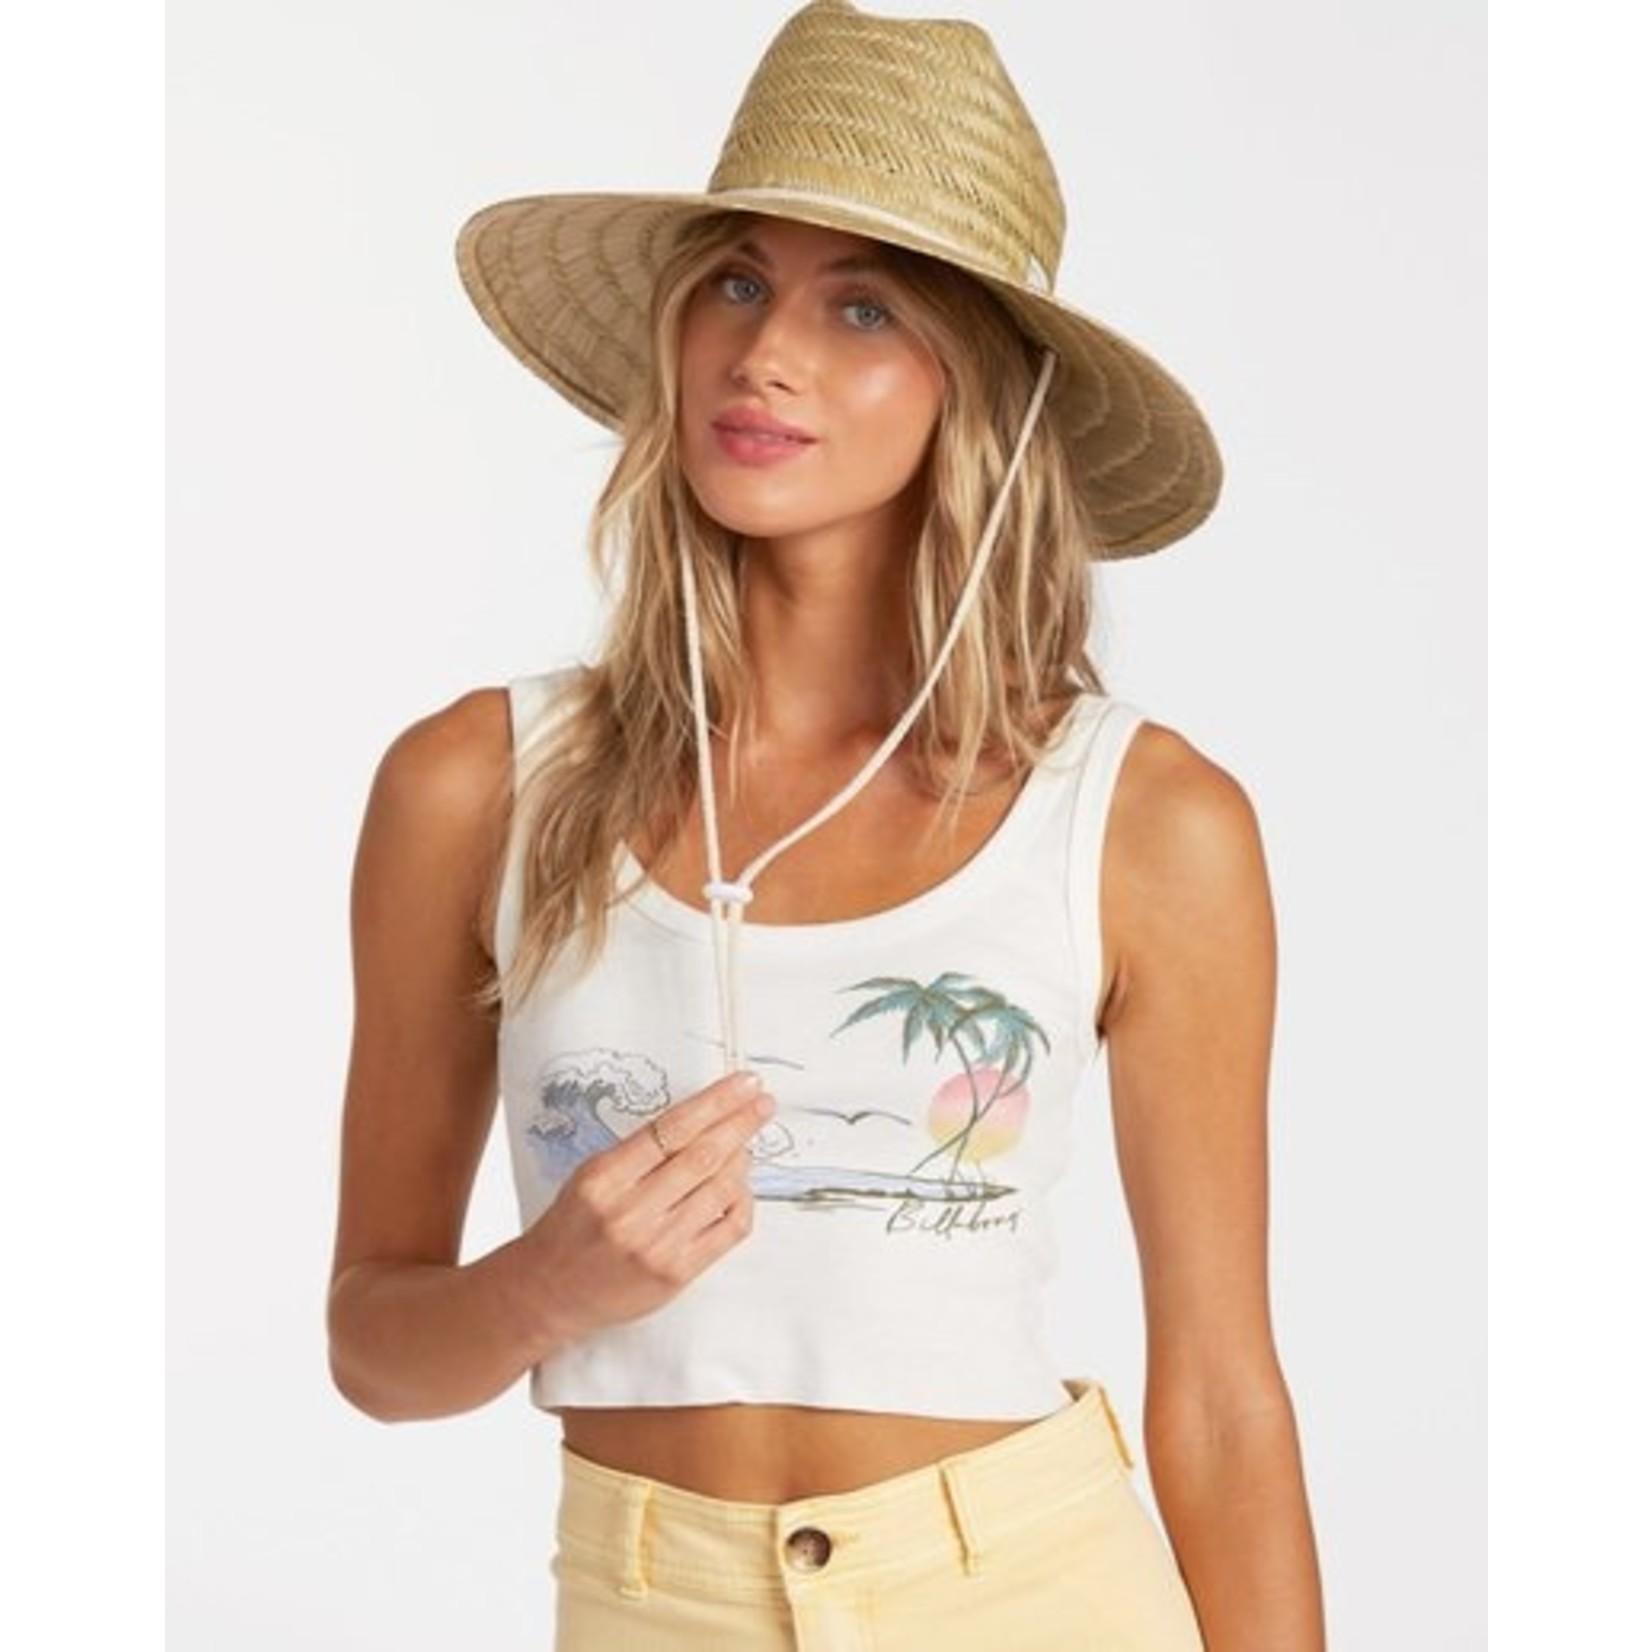 BILLABONG NEW COMER STRAW HAT